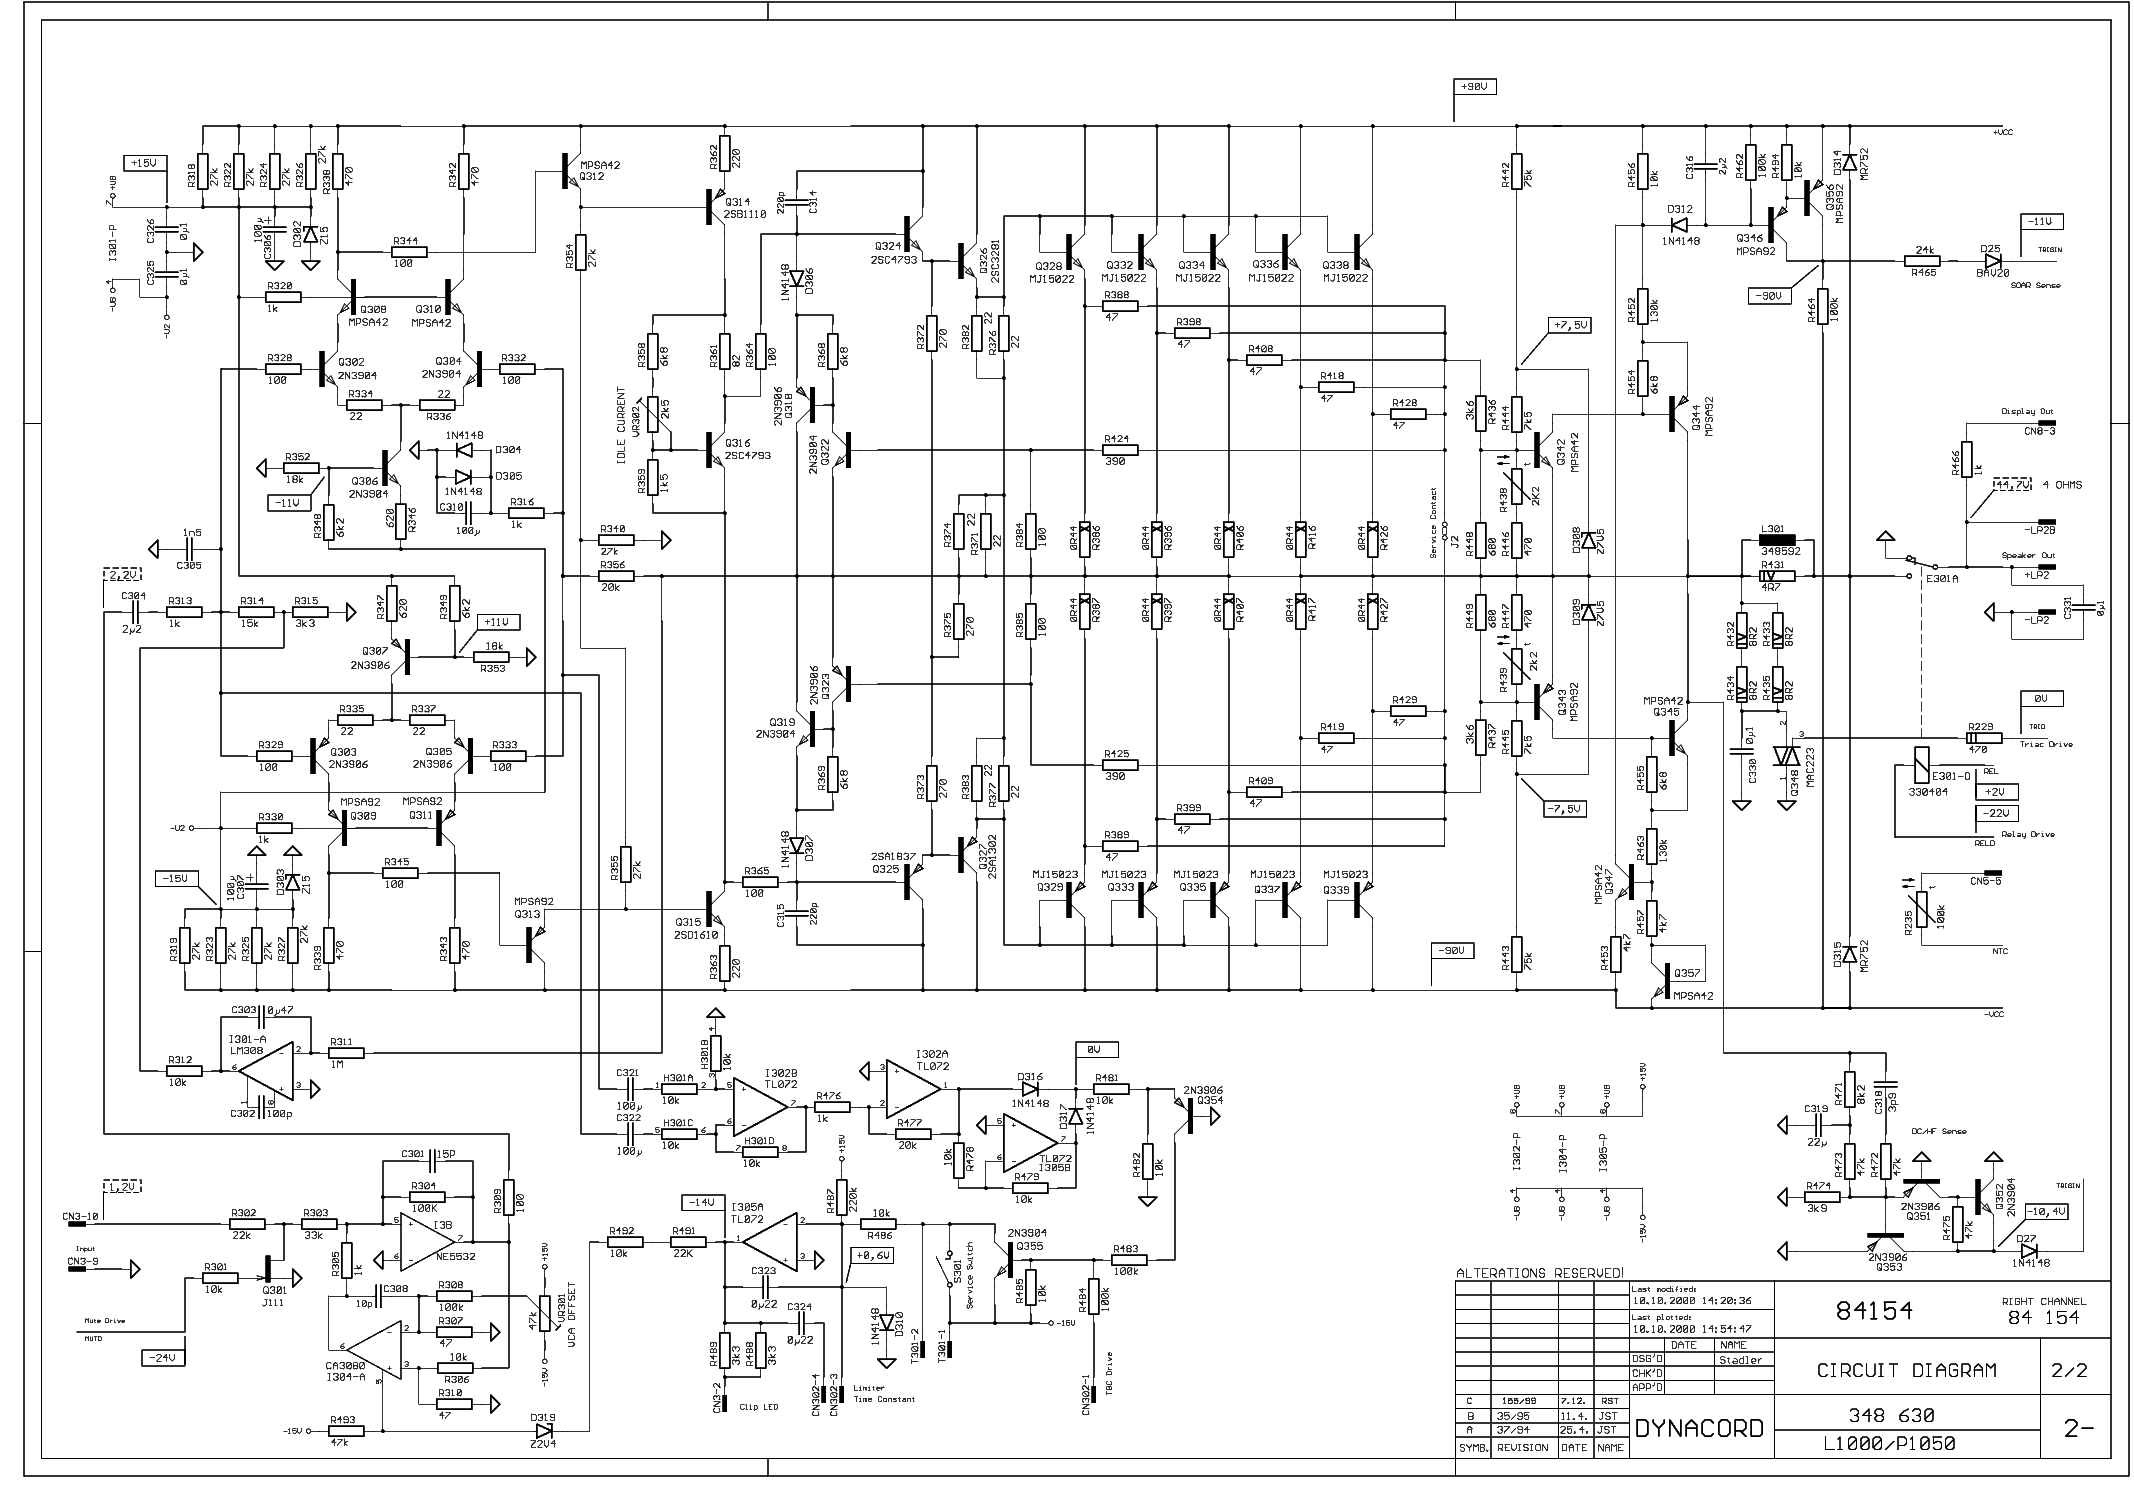 bosch logixx service manual manuell kostenlos rh nycveteransdaycelebrations com bosch service manual refrigerator bosch repair manual dishwasher